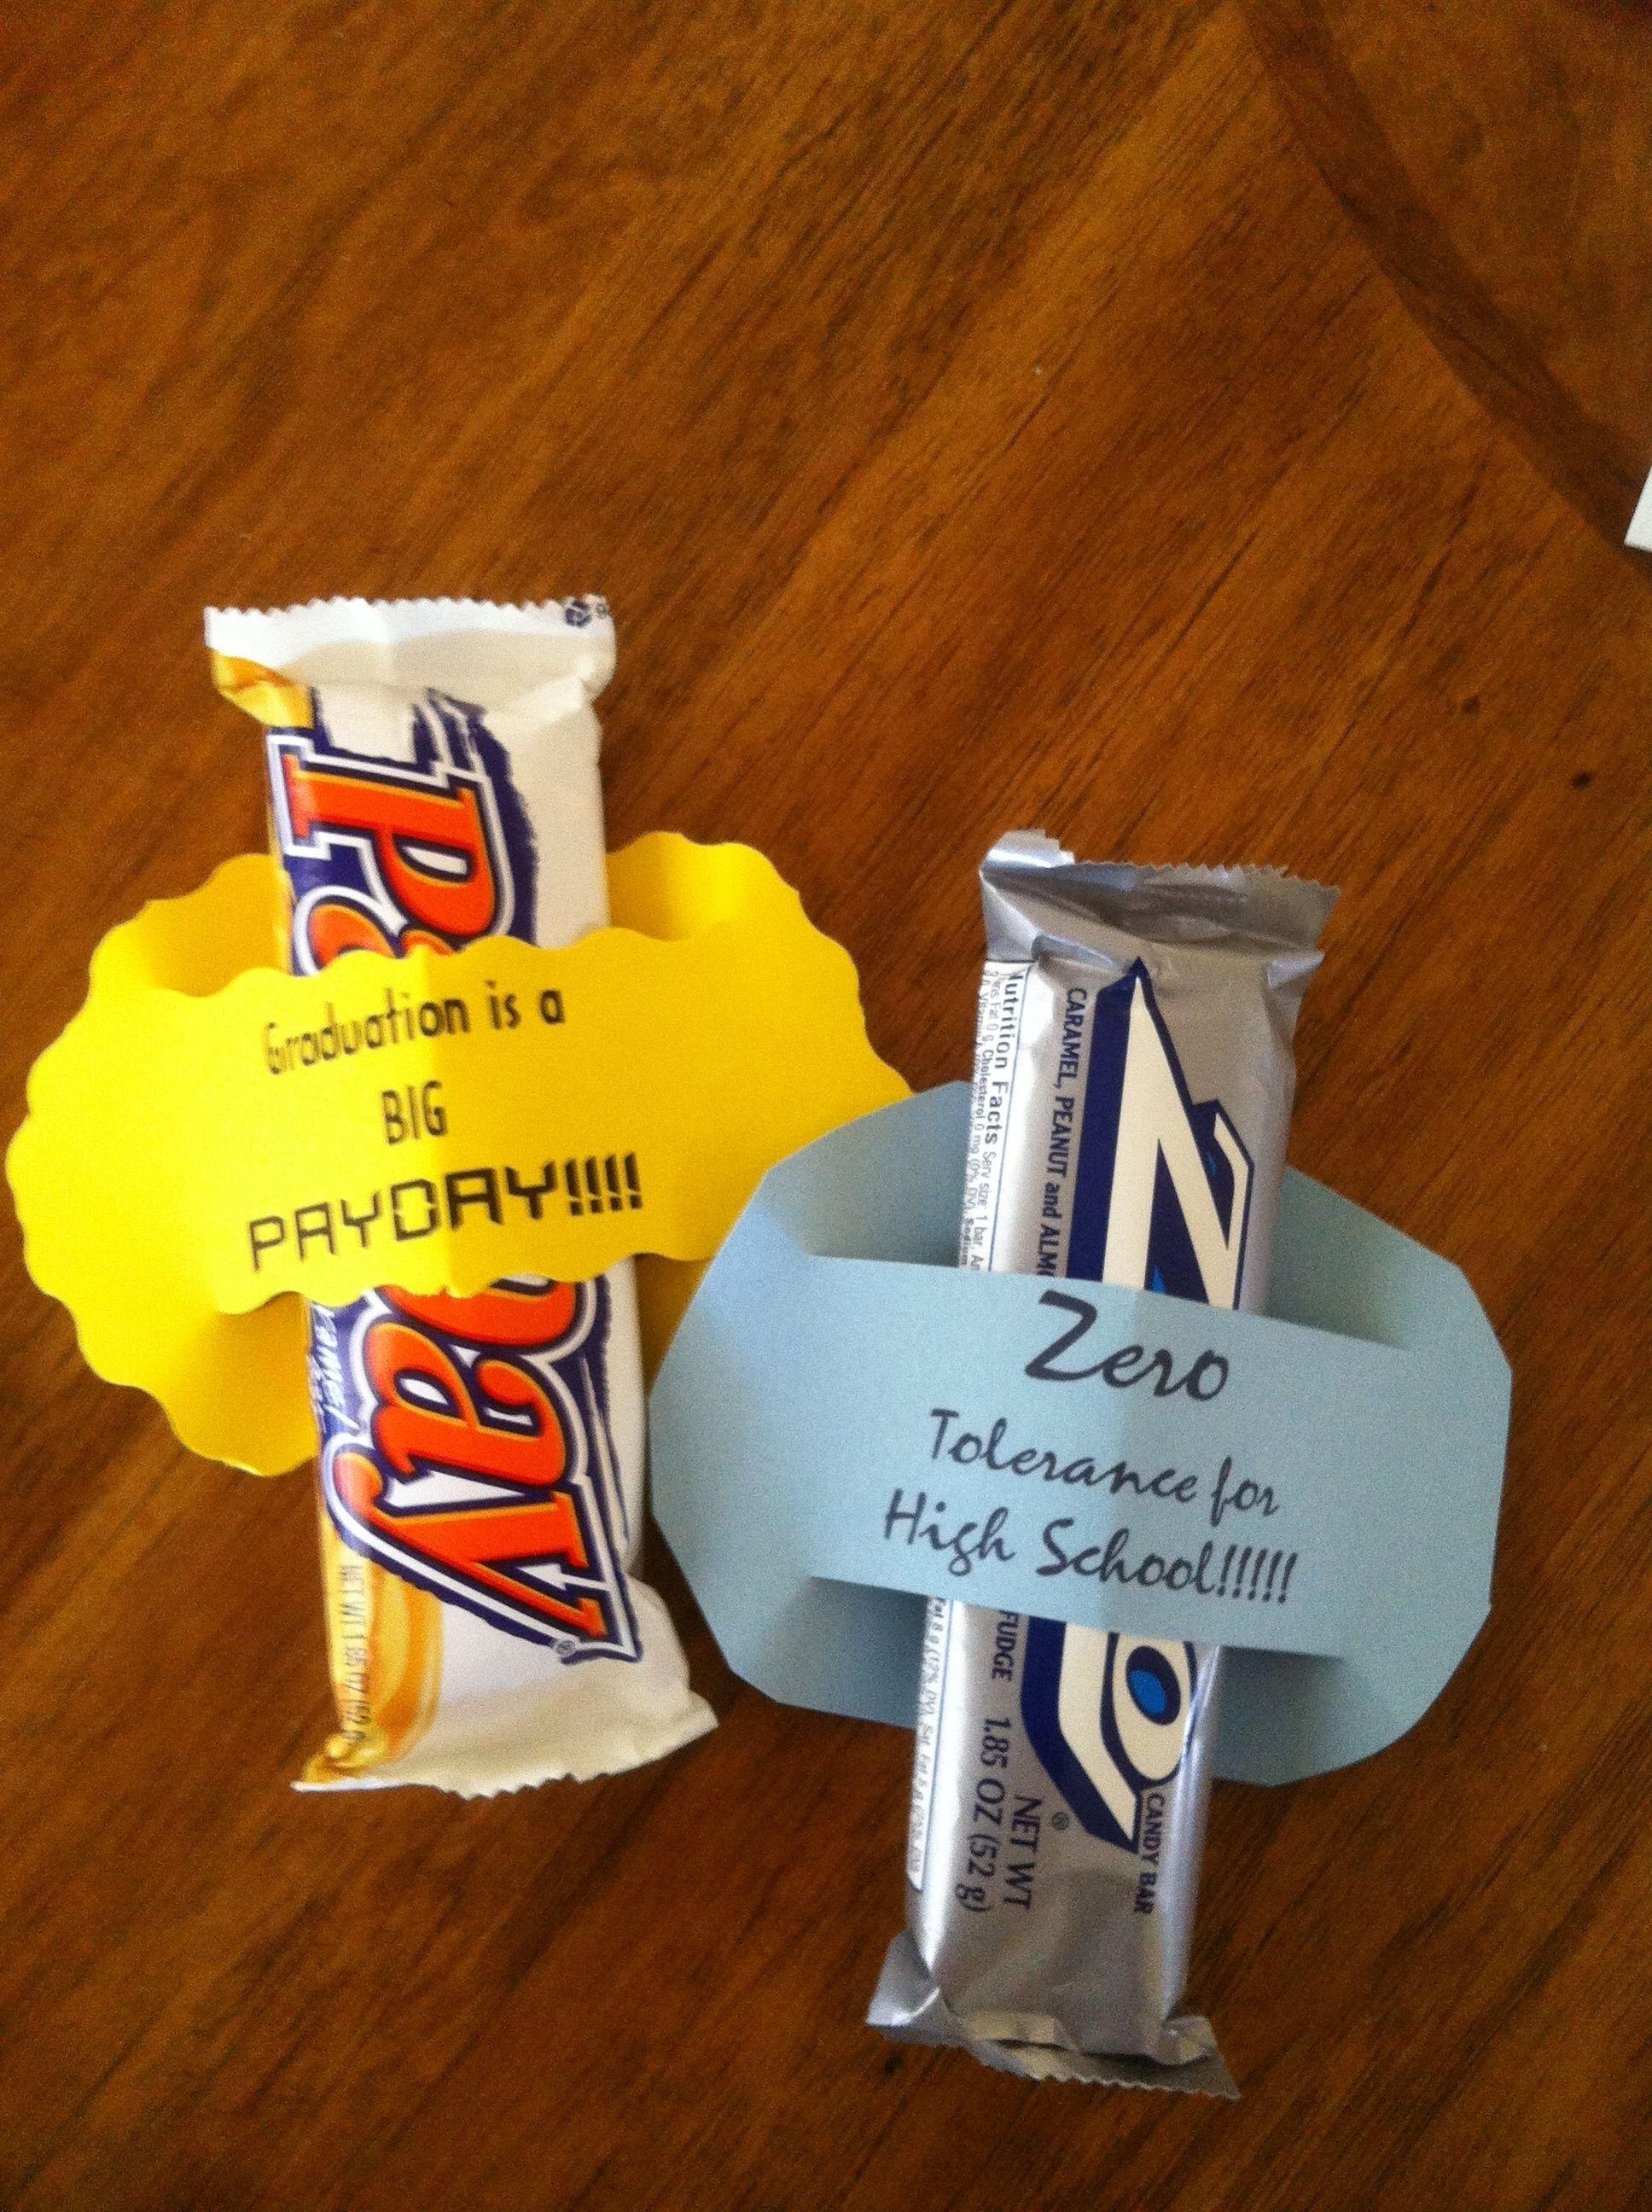 10 Wonderful Graduation Gift Ideas For Son high school graduation party favor party ideas pinterest 21 2021